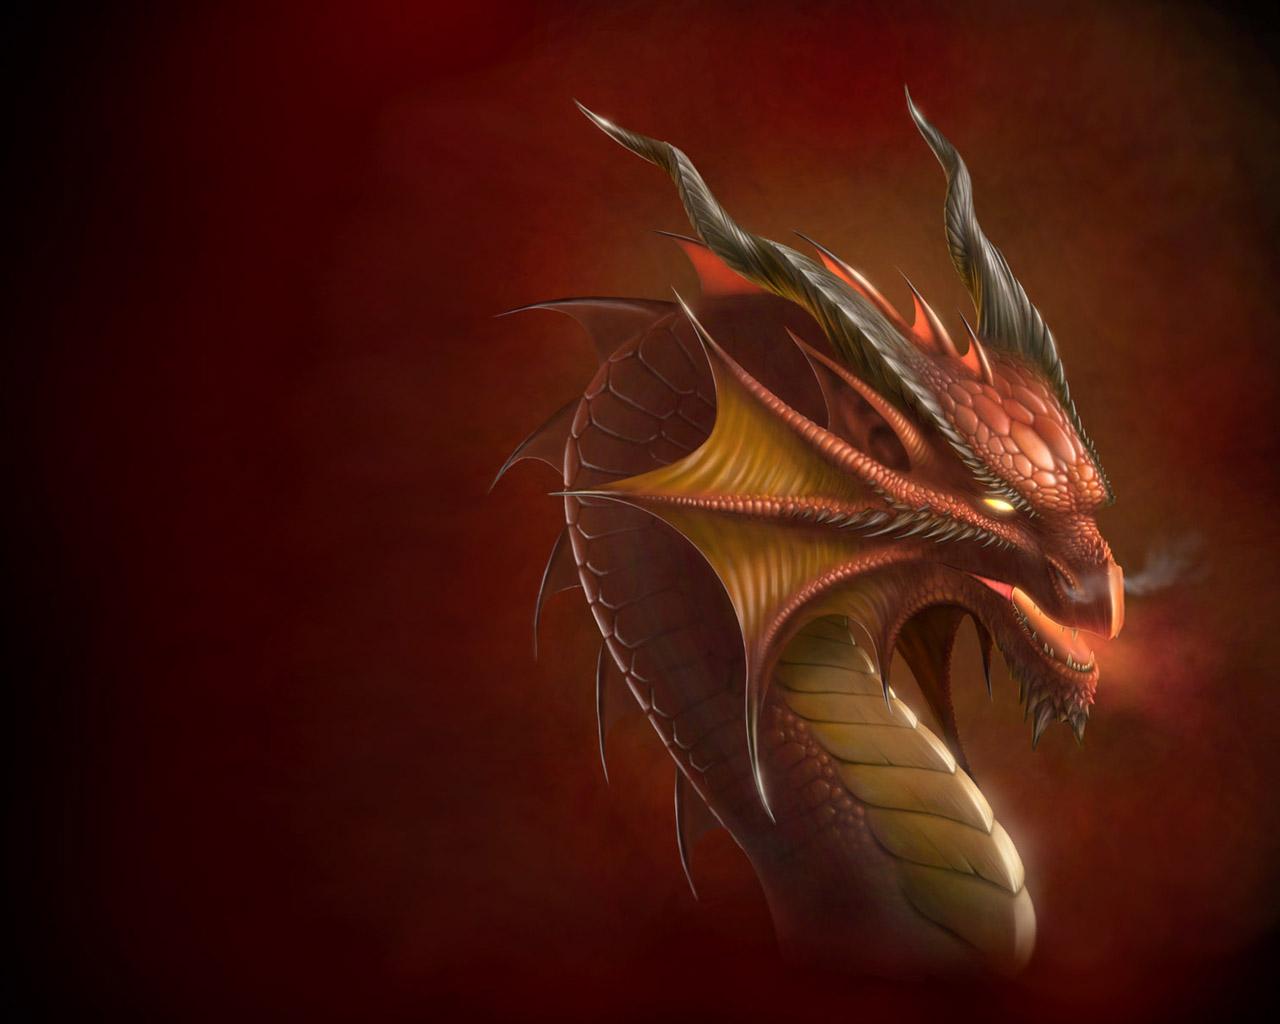 uneedallinside: dragon wallpapers | dragon hd wallpapers | dragon